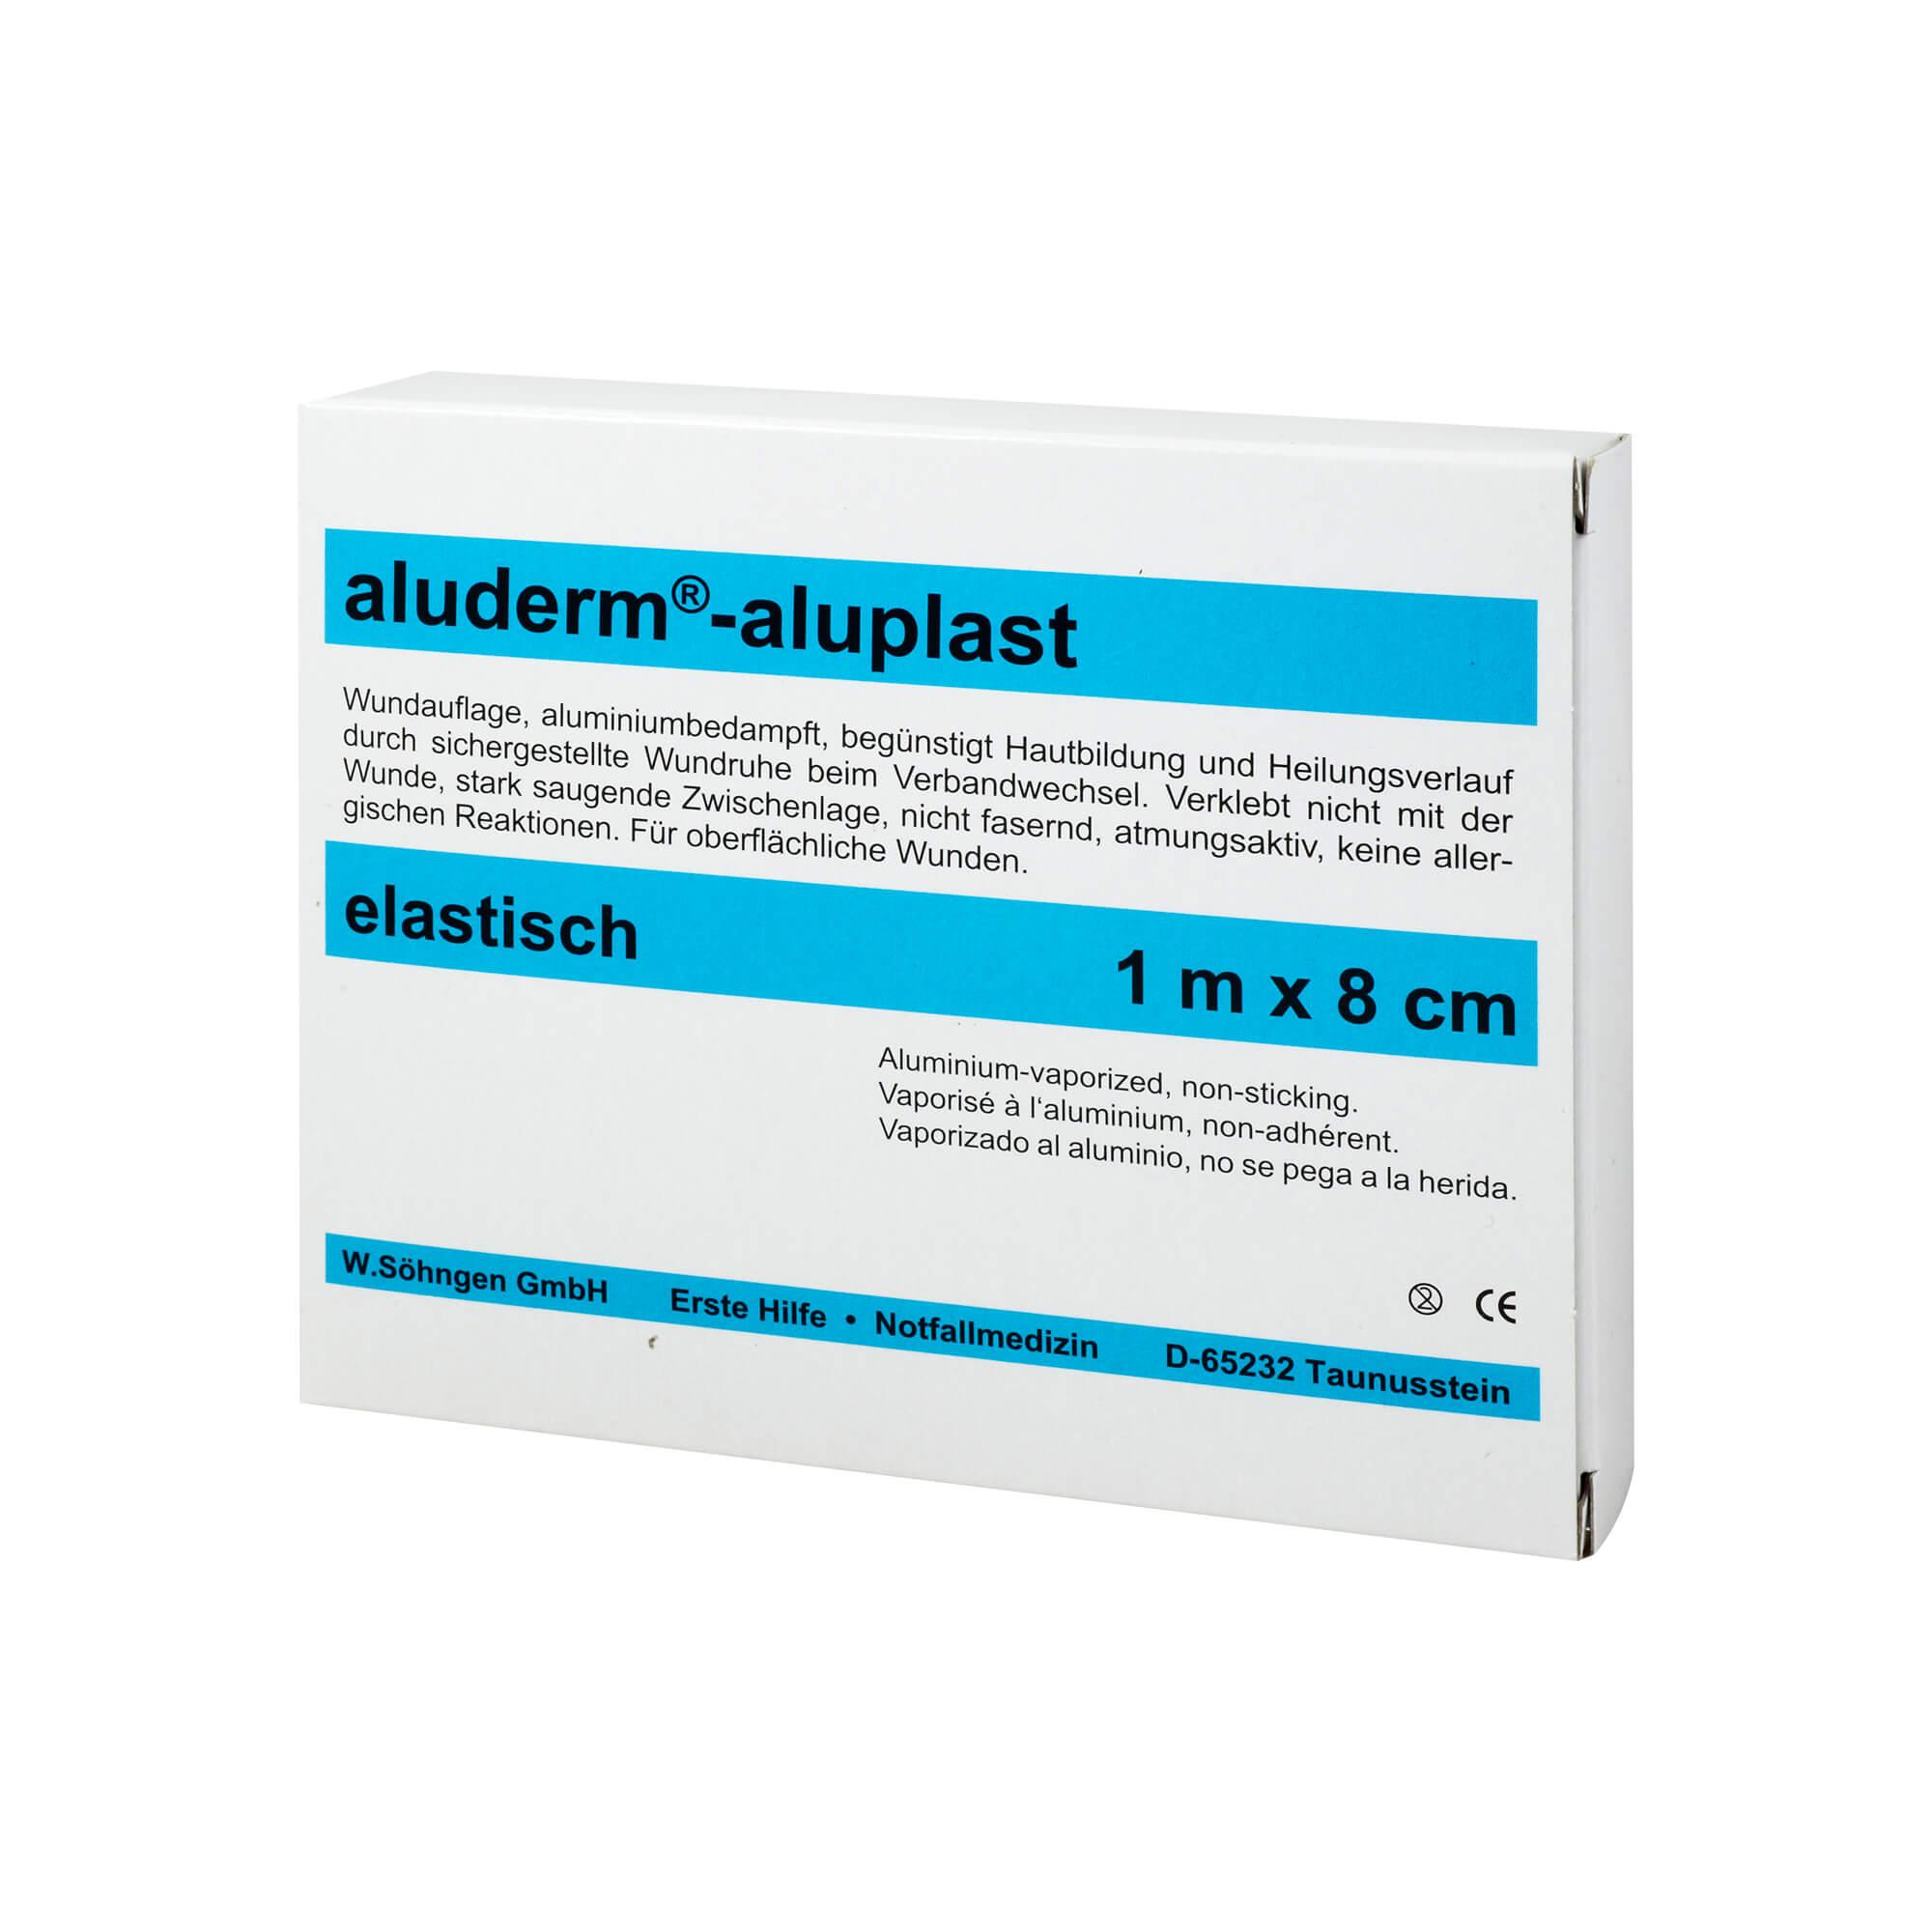 Aluderm Aluplast 1m x 8cm